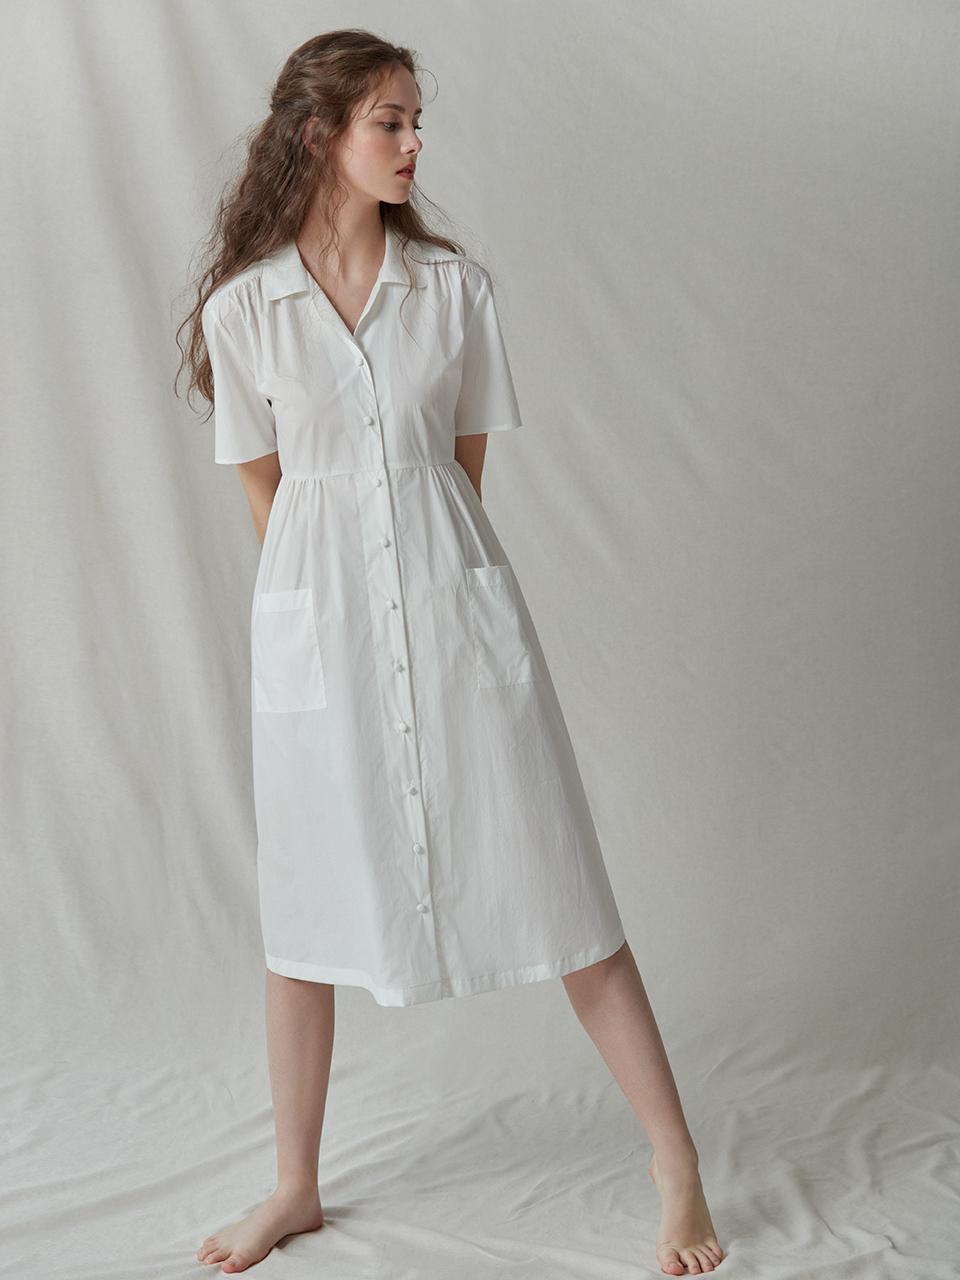 AKRO国际品牌品牌2020春夏经典开领系扣口袋拼接缝褶细节短袖连